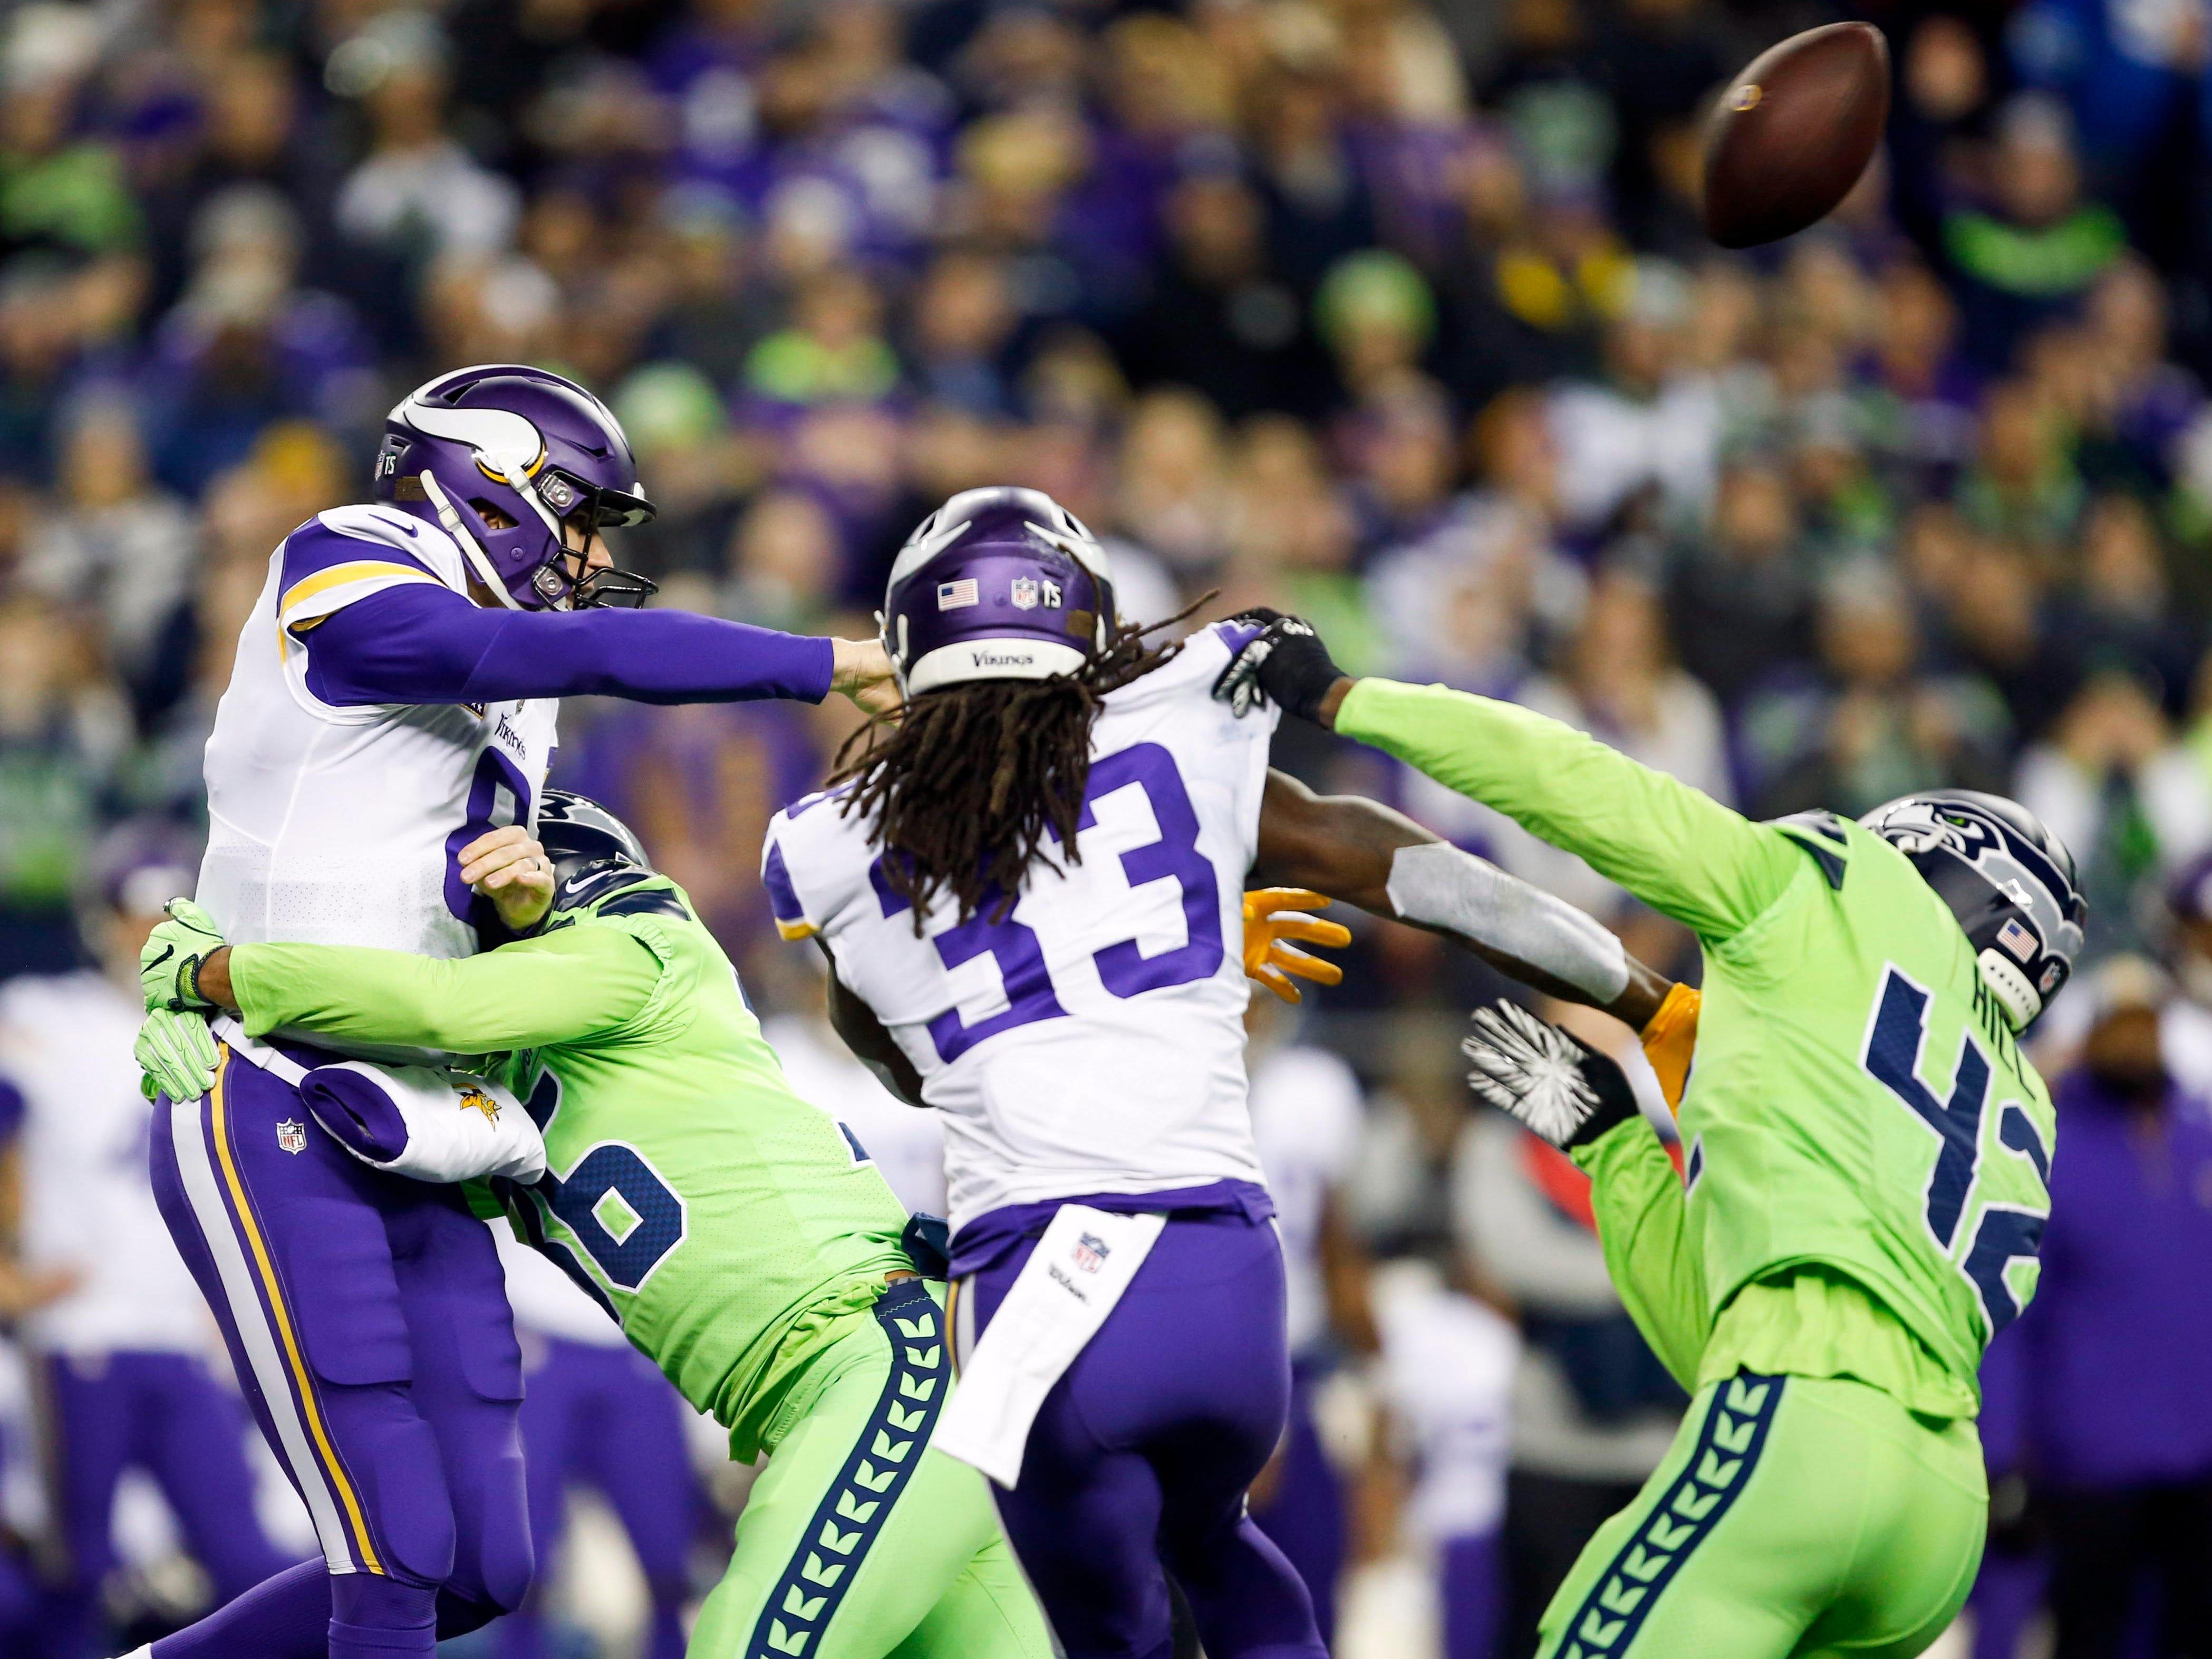 Minnesota Vikings quarterback Kirk Cousins passes under pressure from Seattle Seahawks cornerback Akeem King (36) during the first quarter at CenturyLink Field.